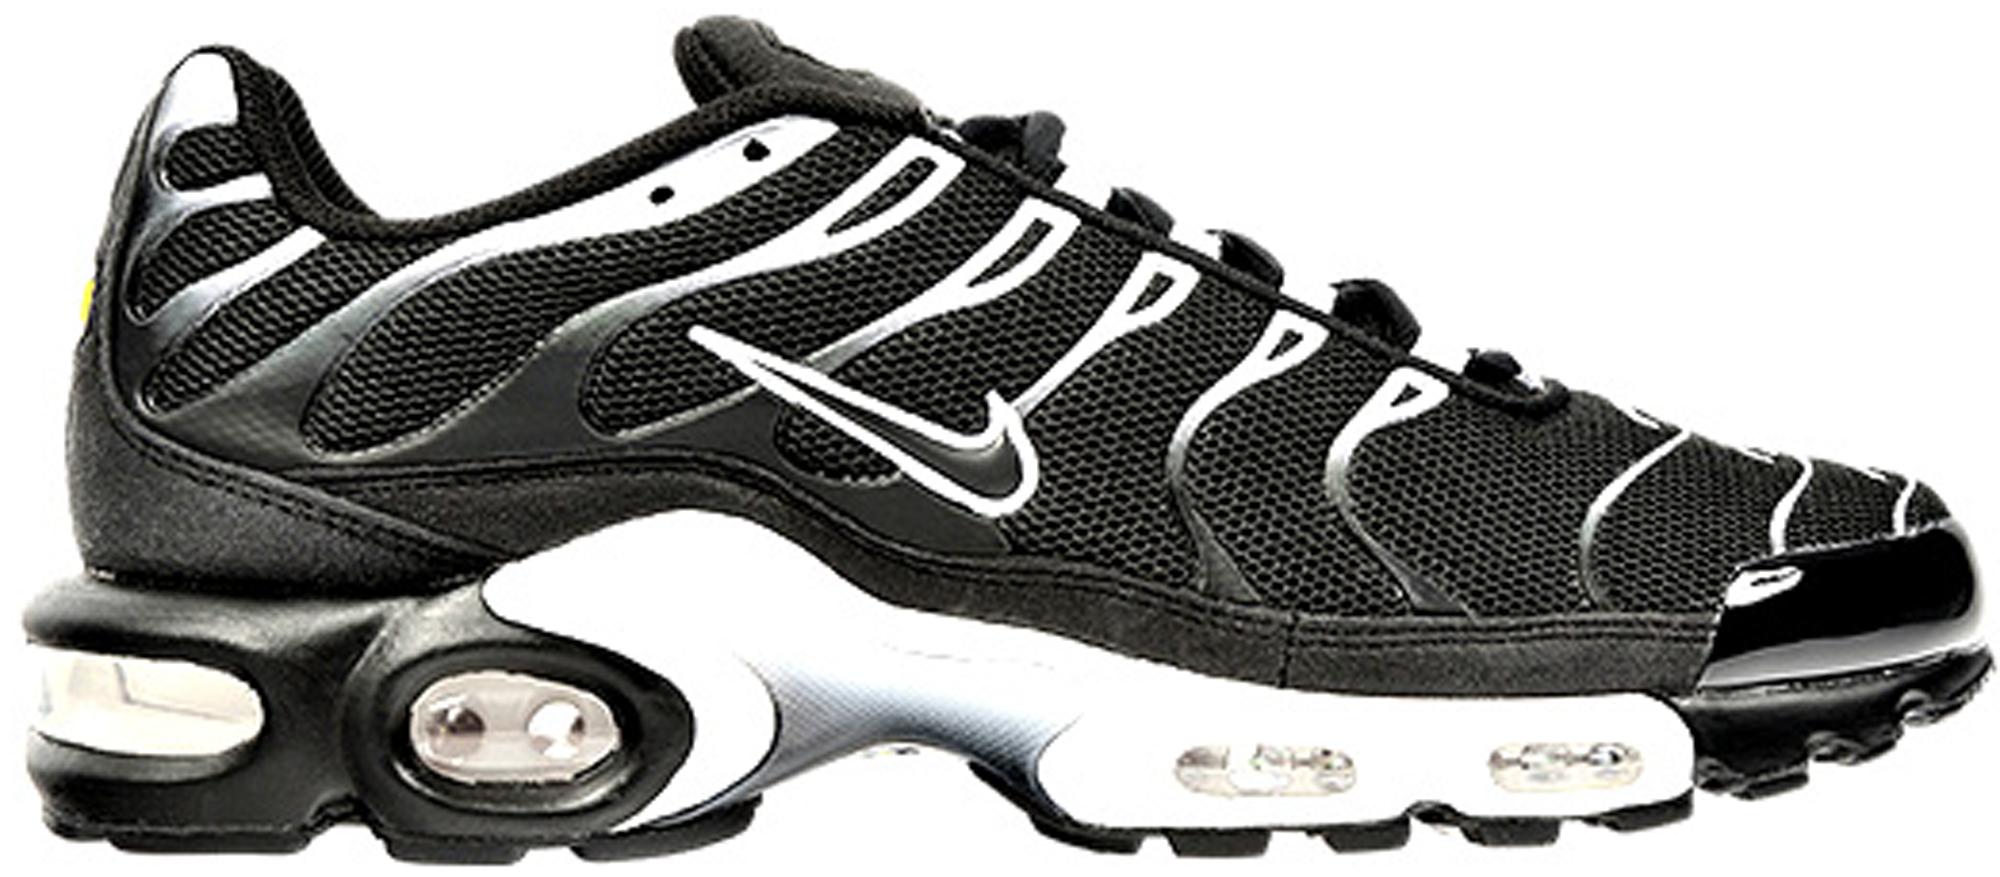 Nike Air Max Plus Frost Black White